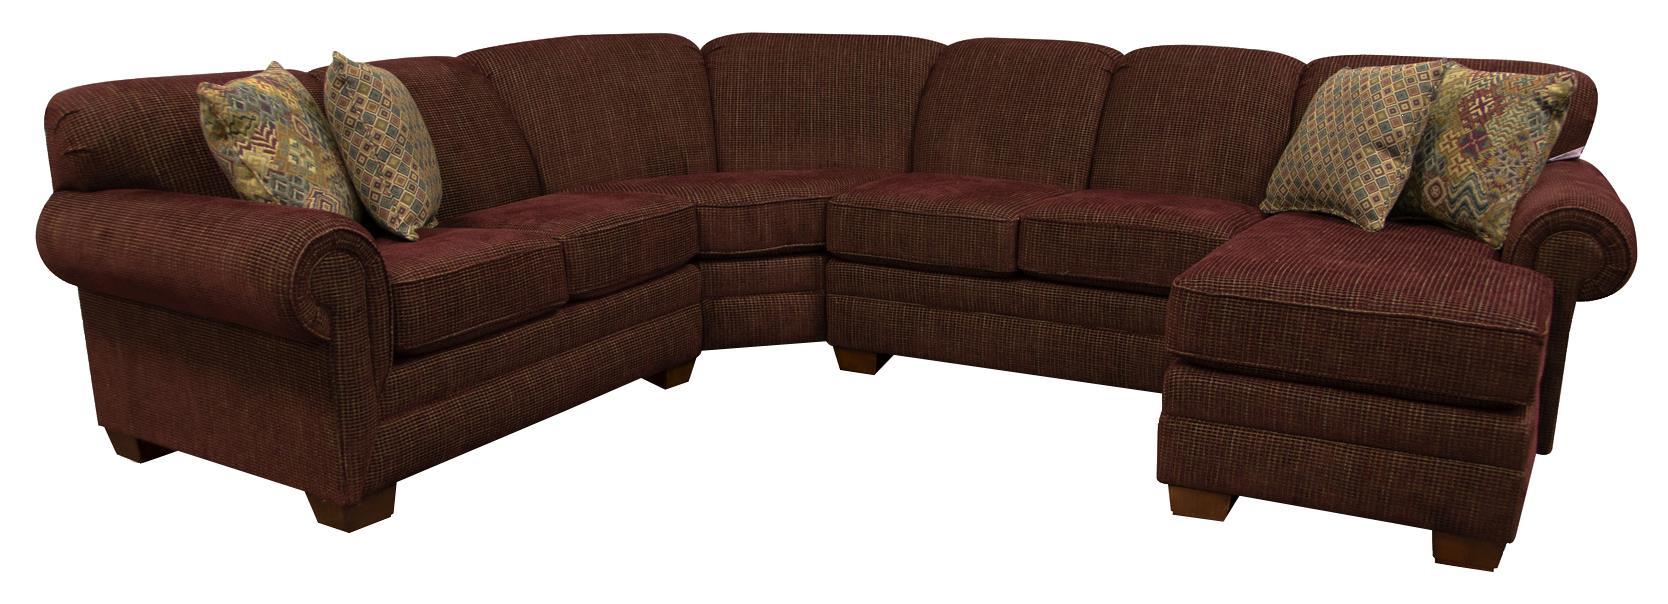 England MonroeSix Seat Sectional Sofa